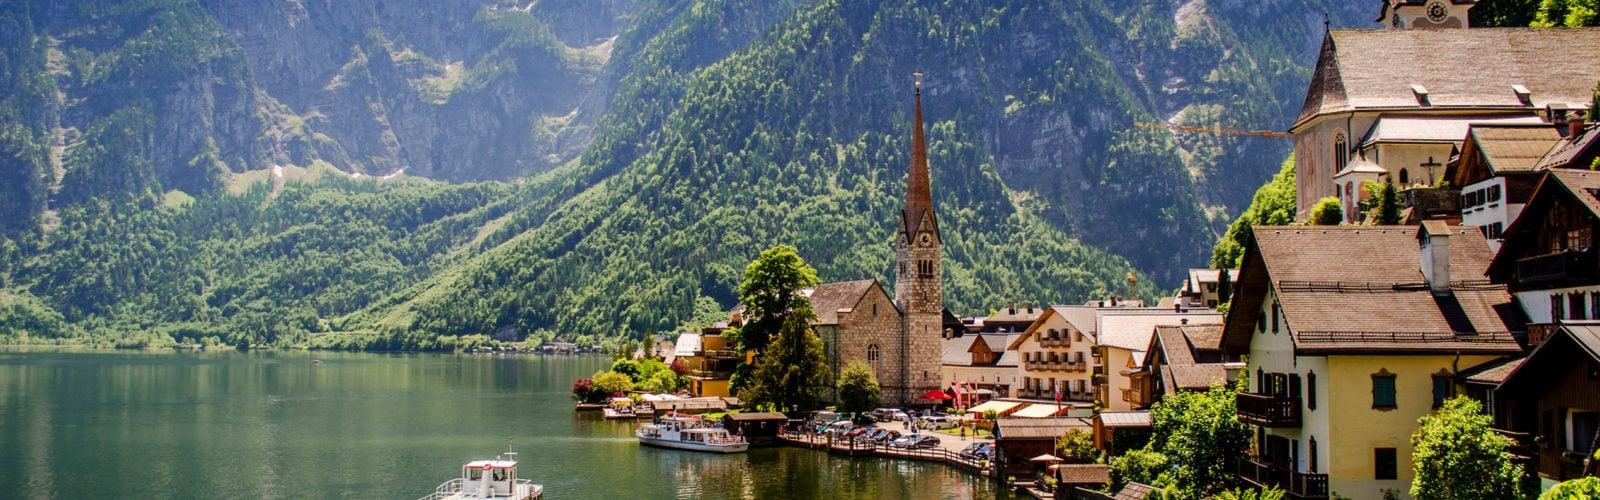 hallstatt-town-alps-austria